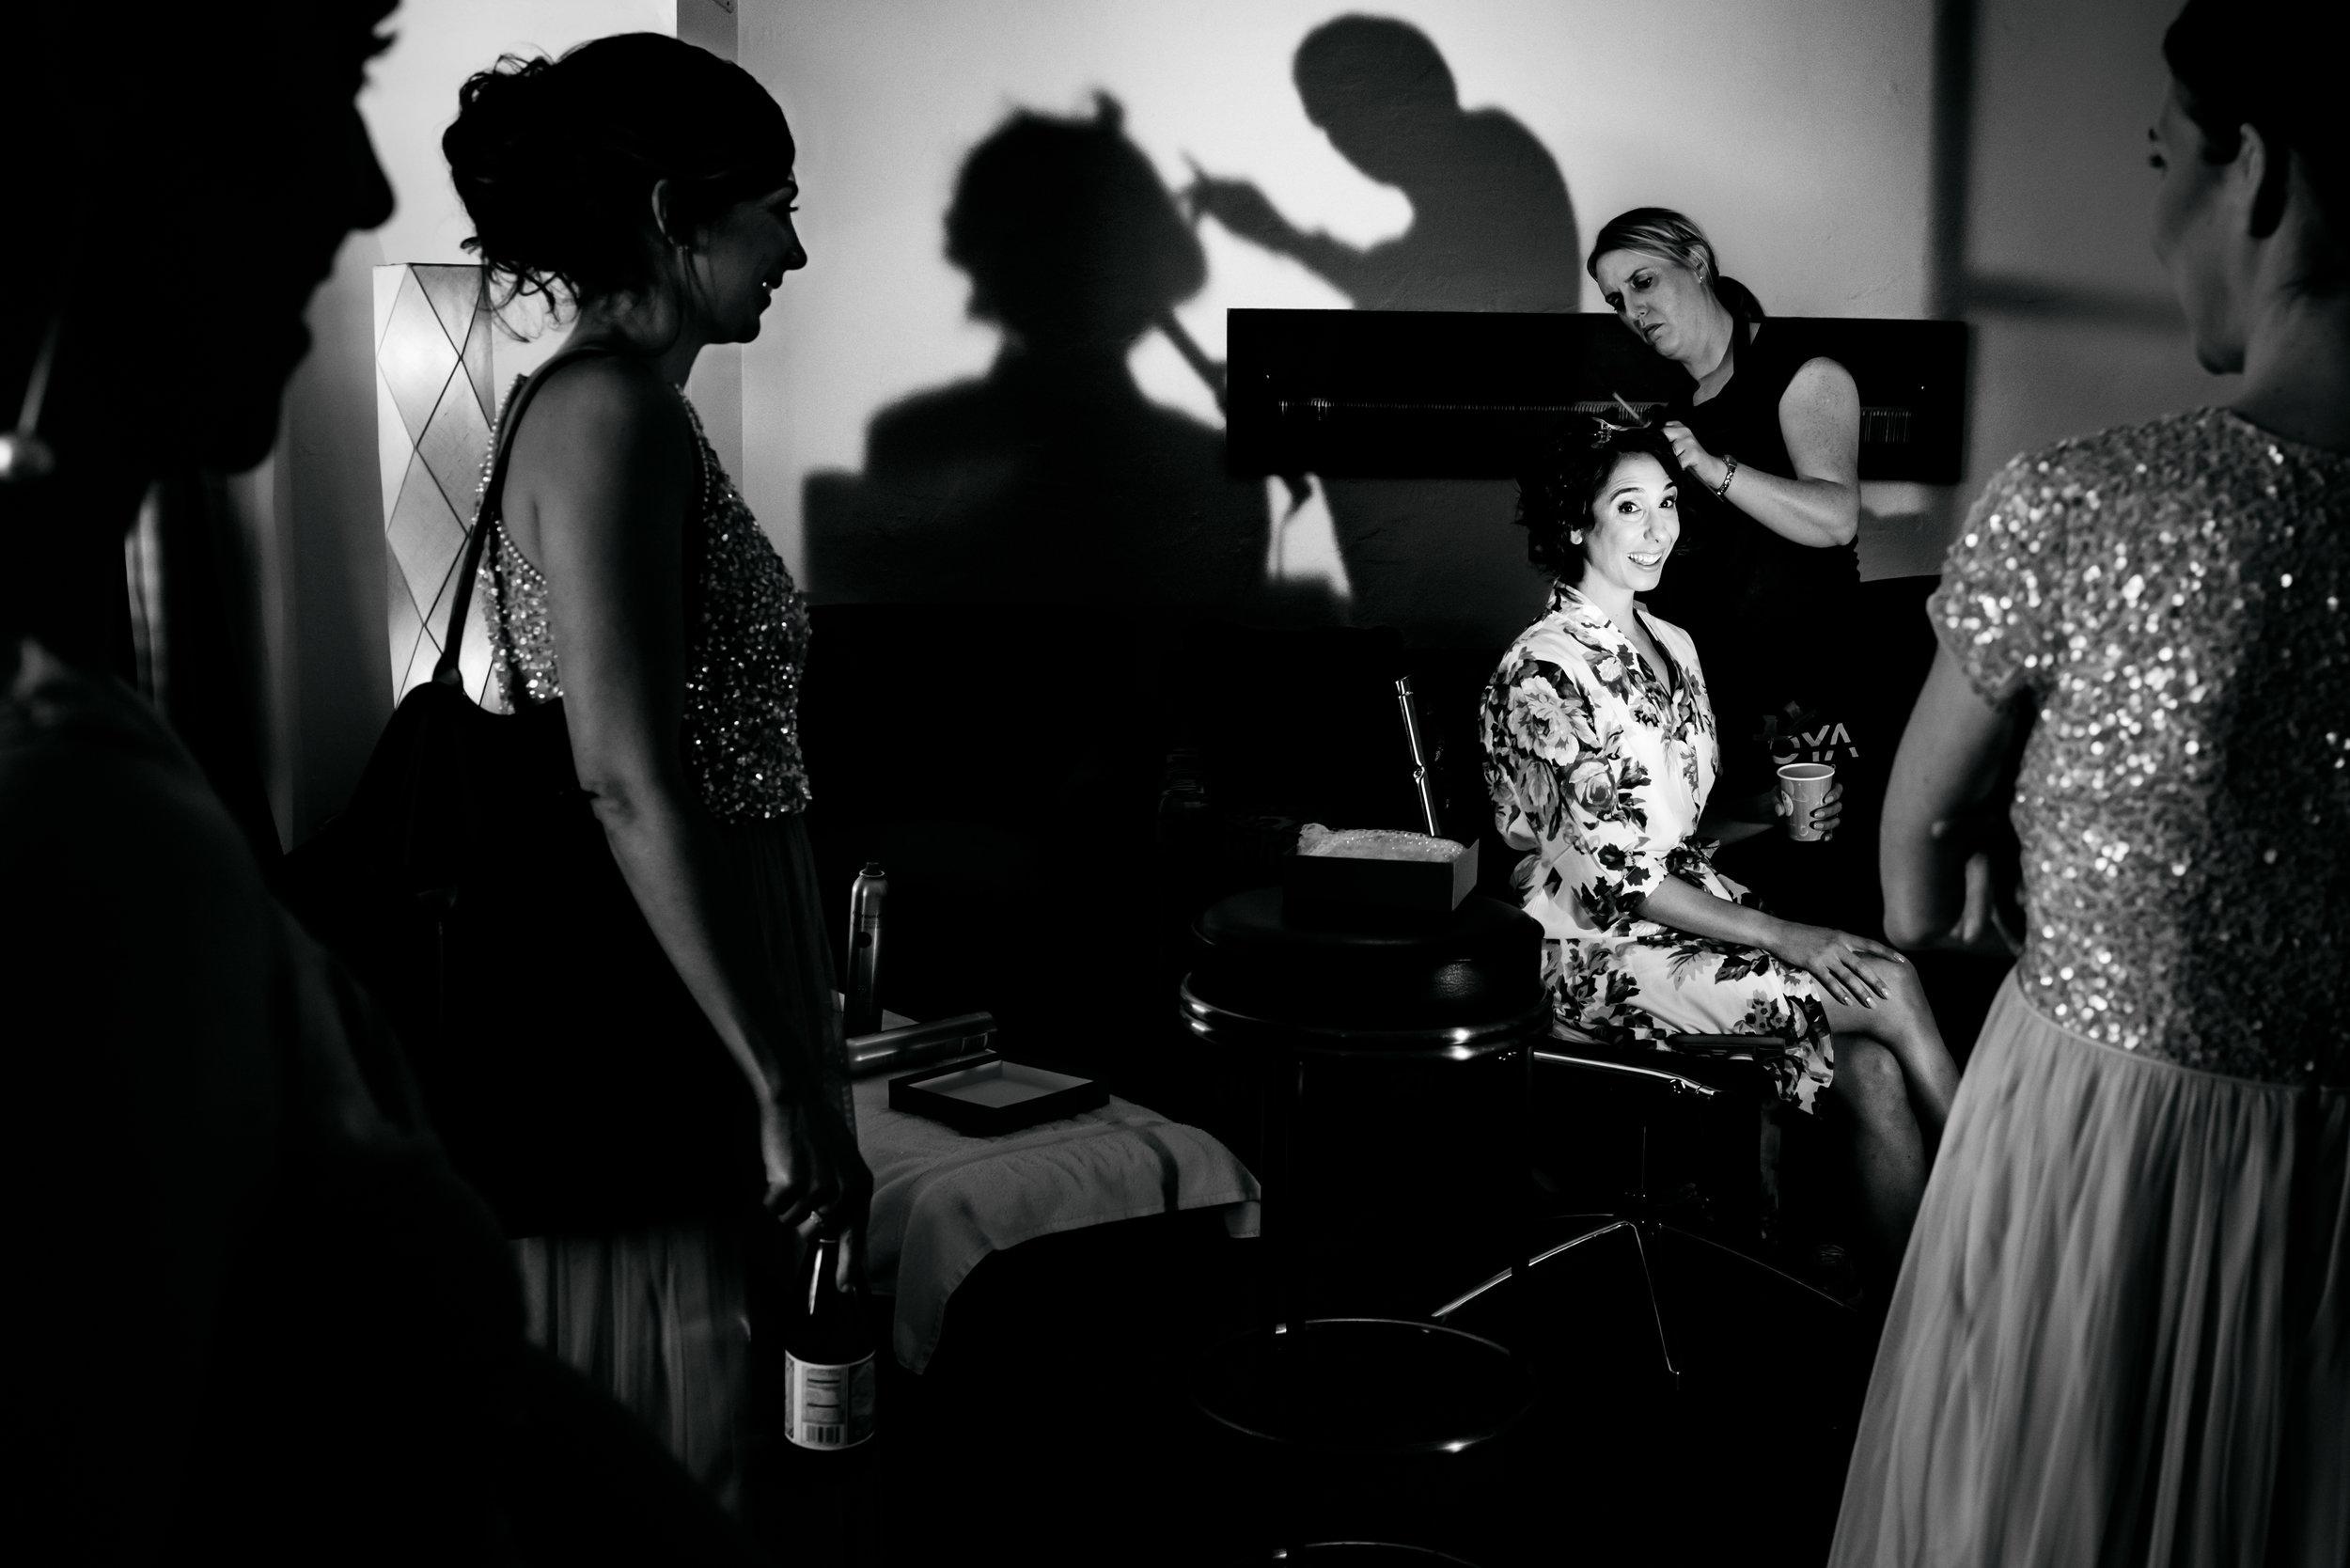 Extended_Play_Photography_Carmella_Wedding-7.jpg